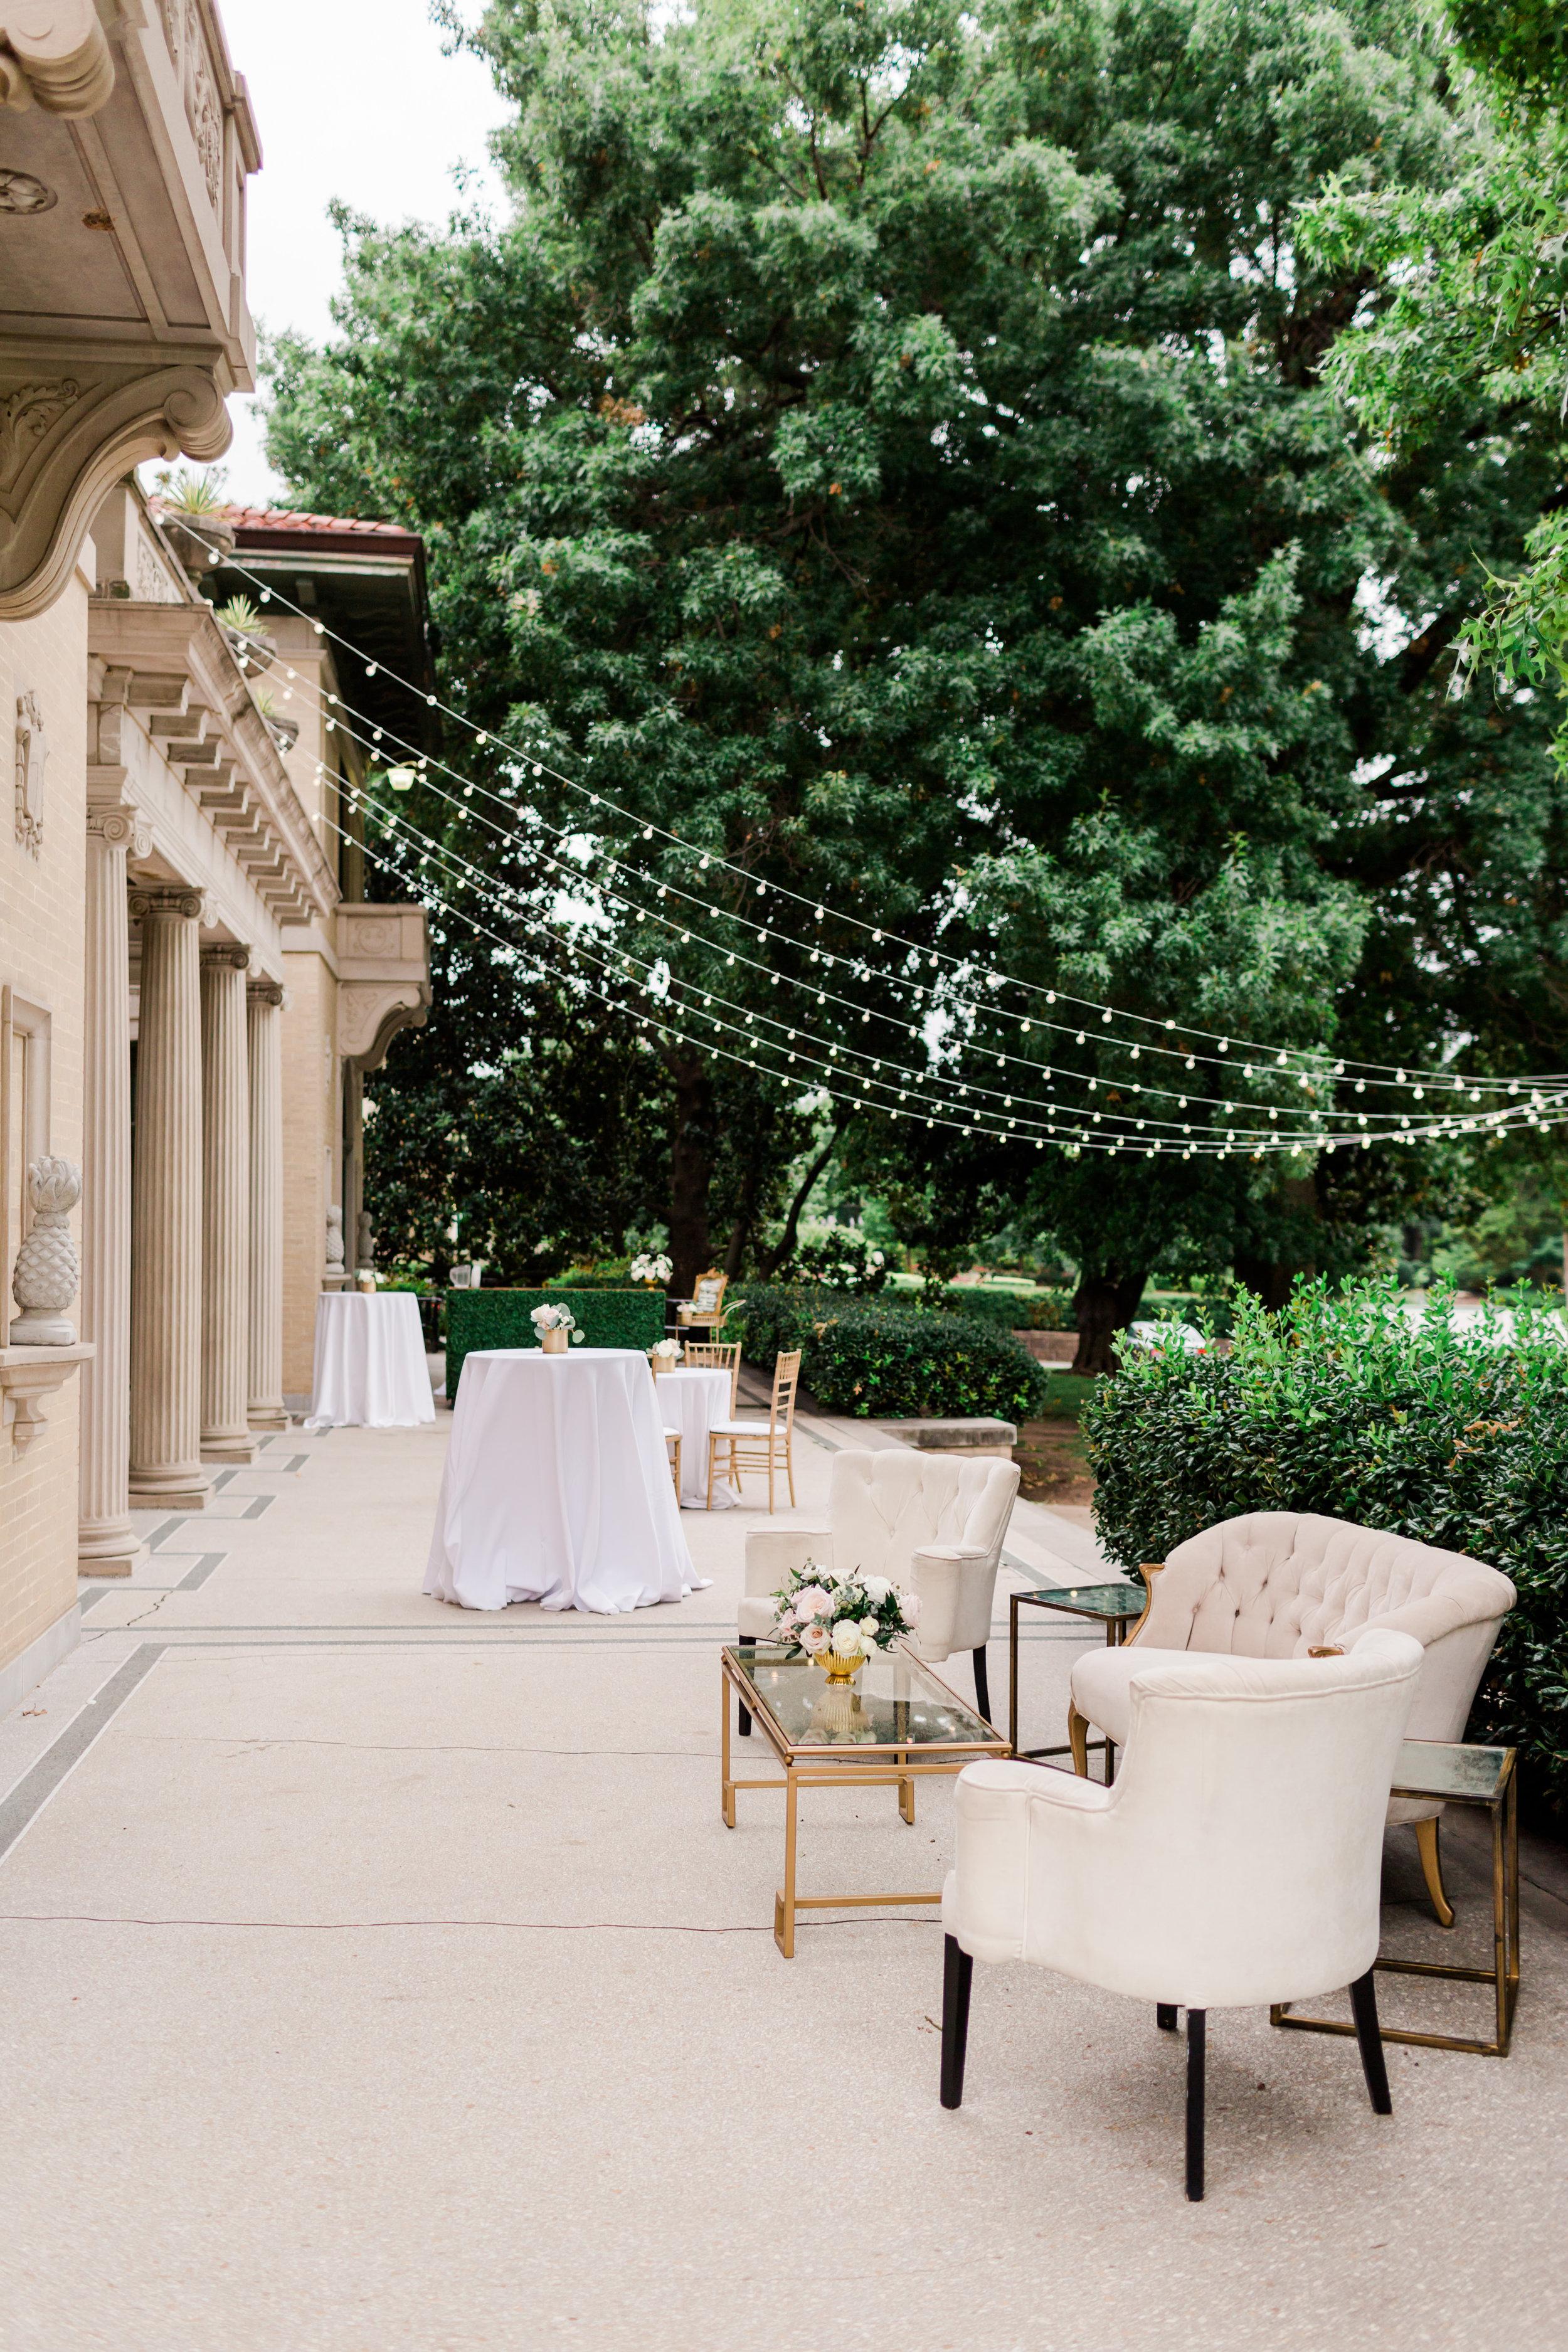 The Mansion at Woodward Park Tulsa Oklahoma Wedding_Valorie Darling Photography-6569.jpg